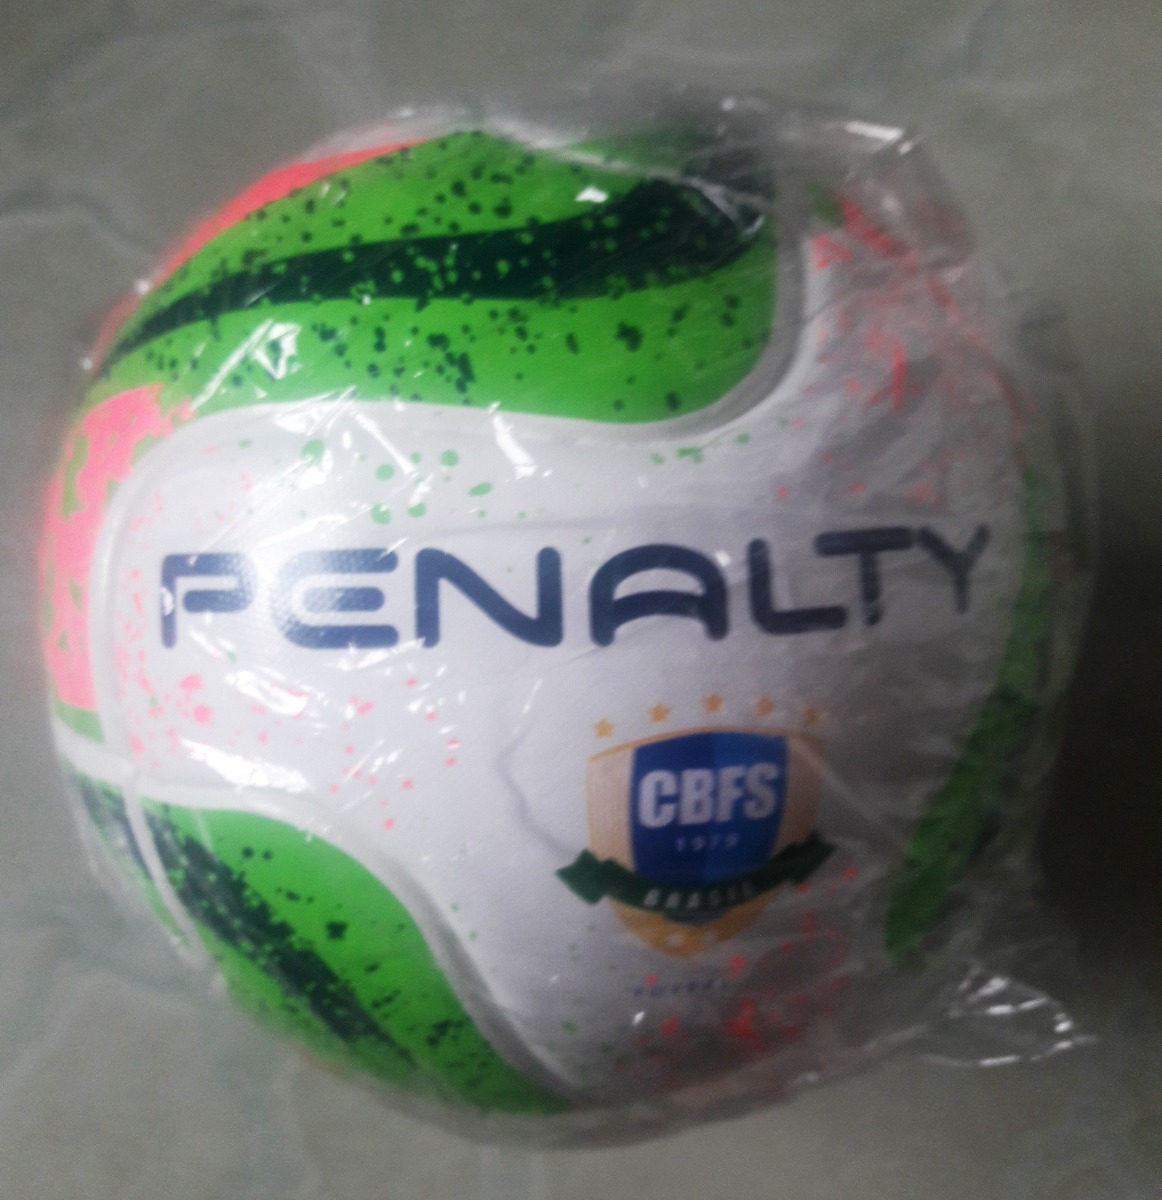 afdd0e82db3a9 bola futsal penalty max 200 sub 13 - oficial e original. Carregando zoom.